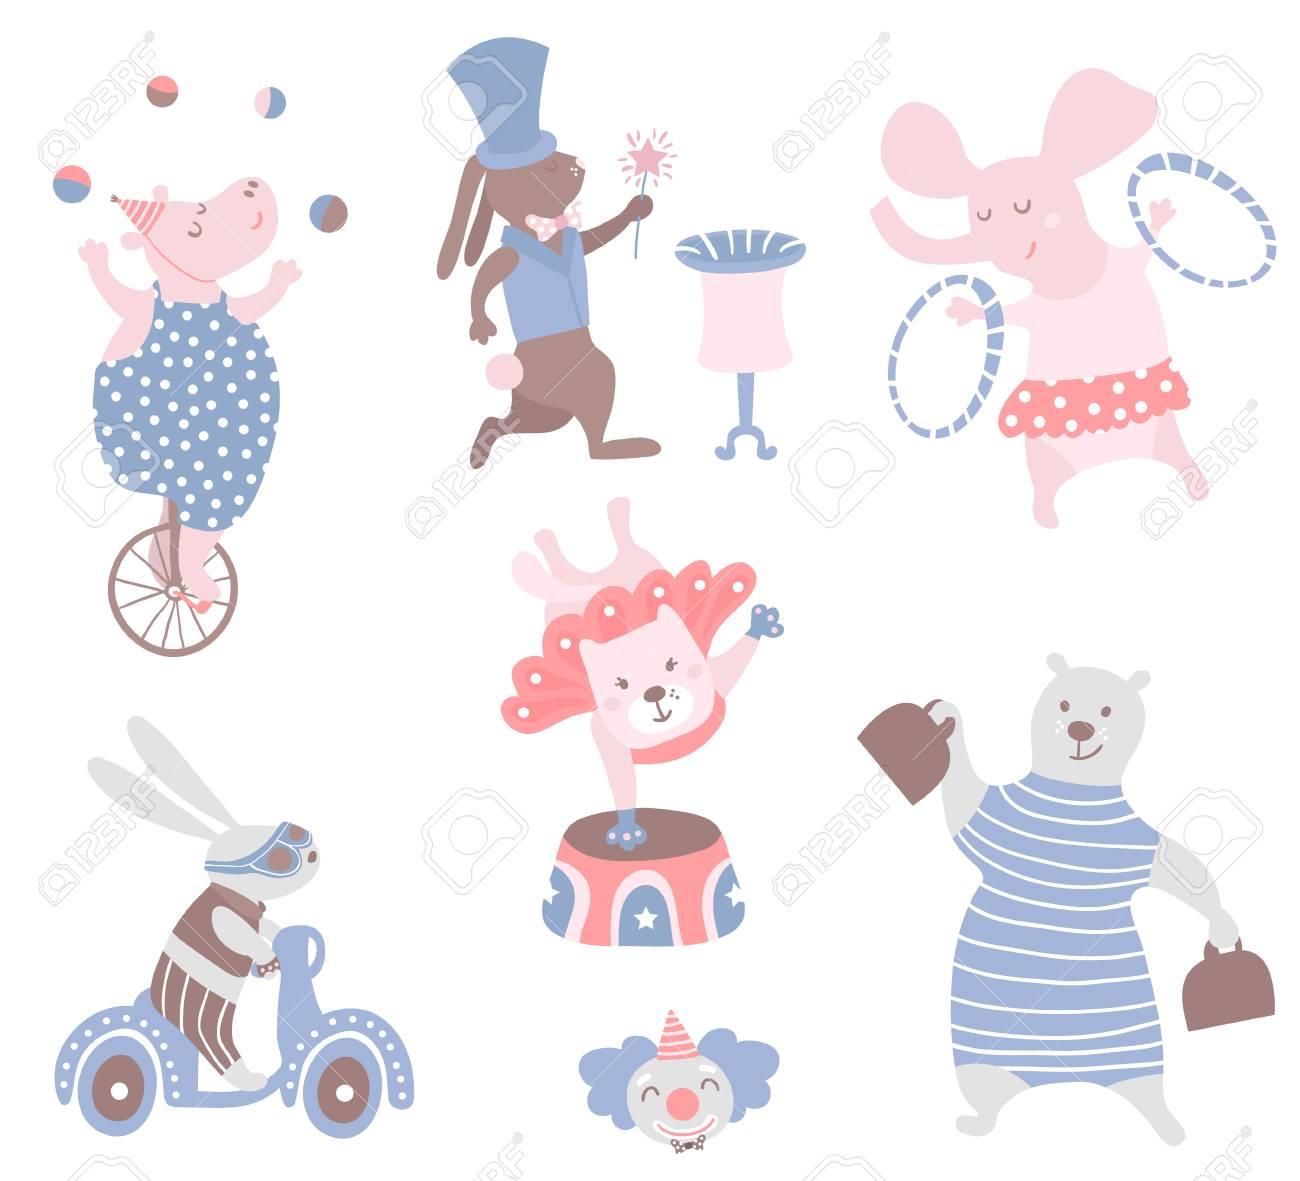 Circus animals vector clipart. Hippo, cat, bear,bunny,elephant,rabbit.